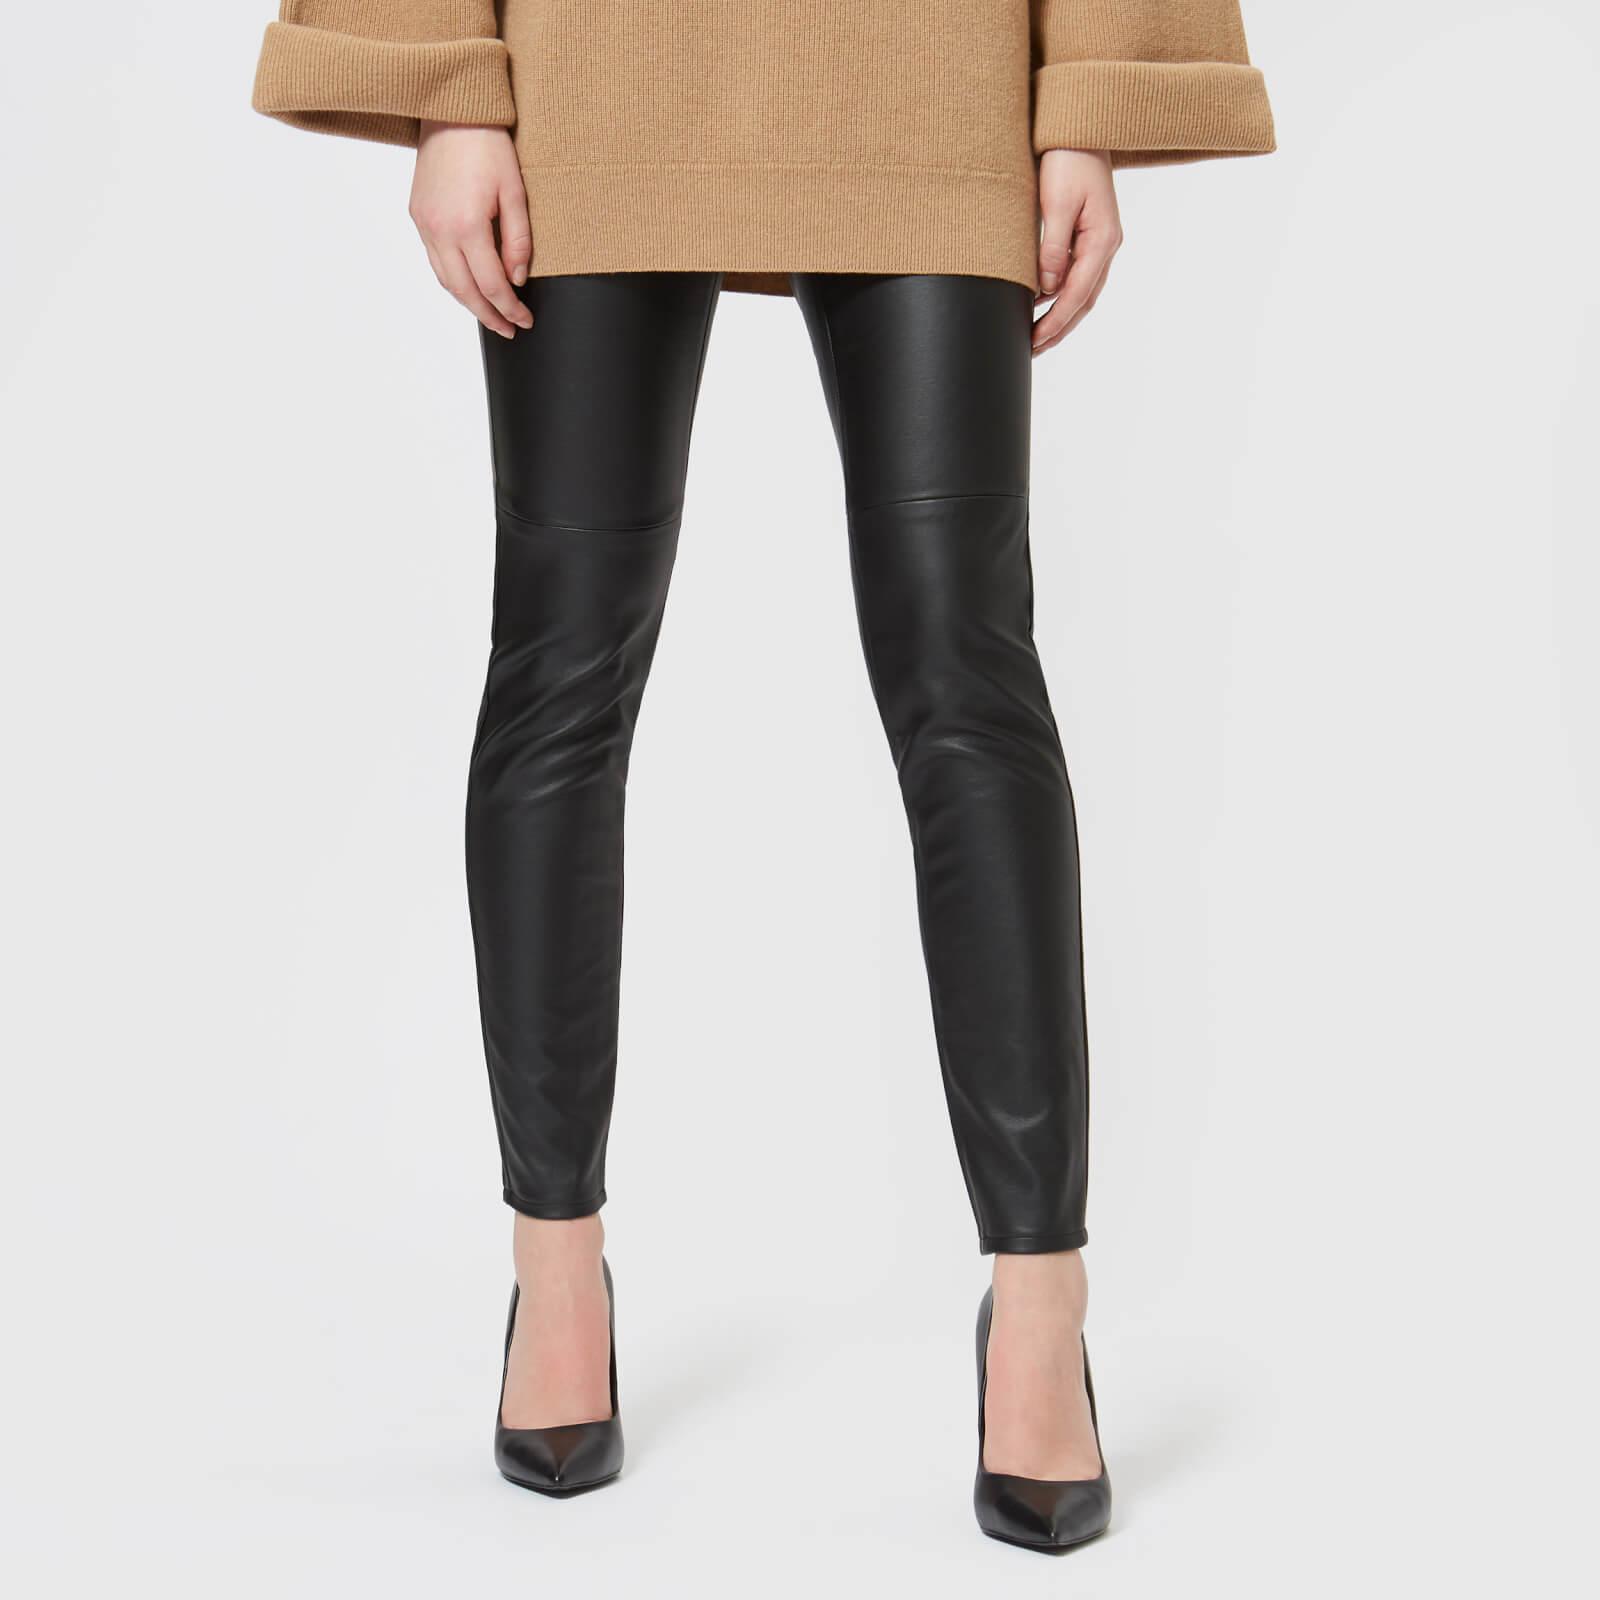 5c03d24330e4bd MICHAEL MICHAEL KORS Women's Faux Leather Leggings - Black Womens Clothing  | TheHut.com